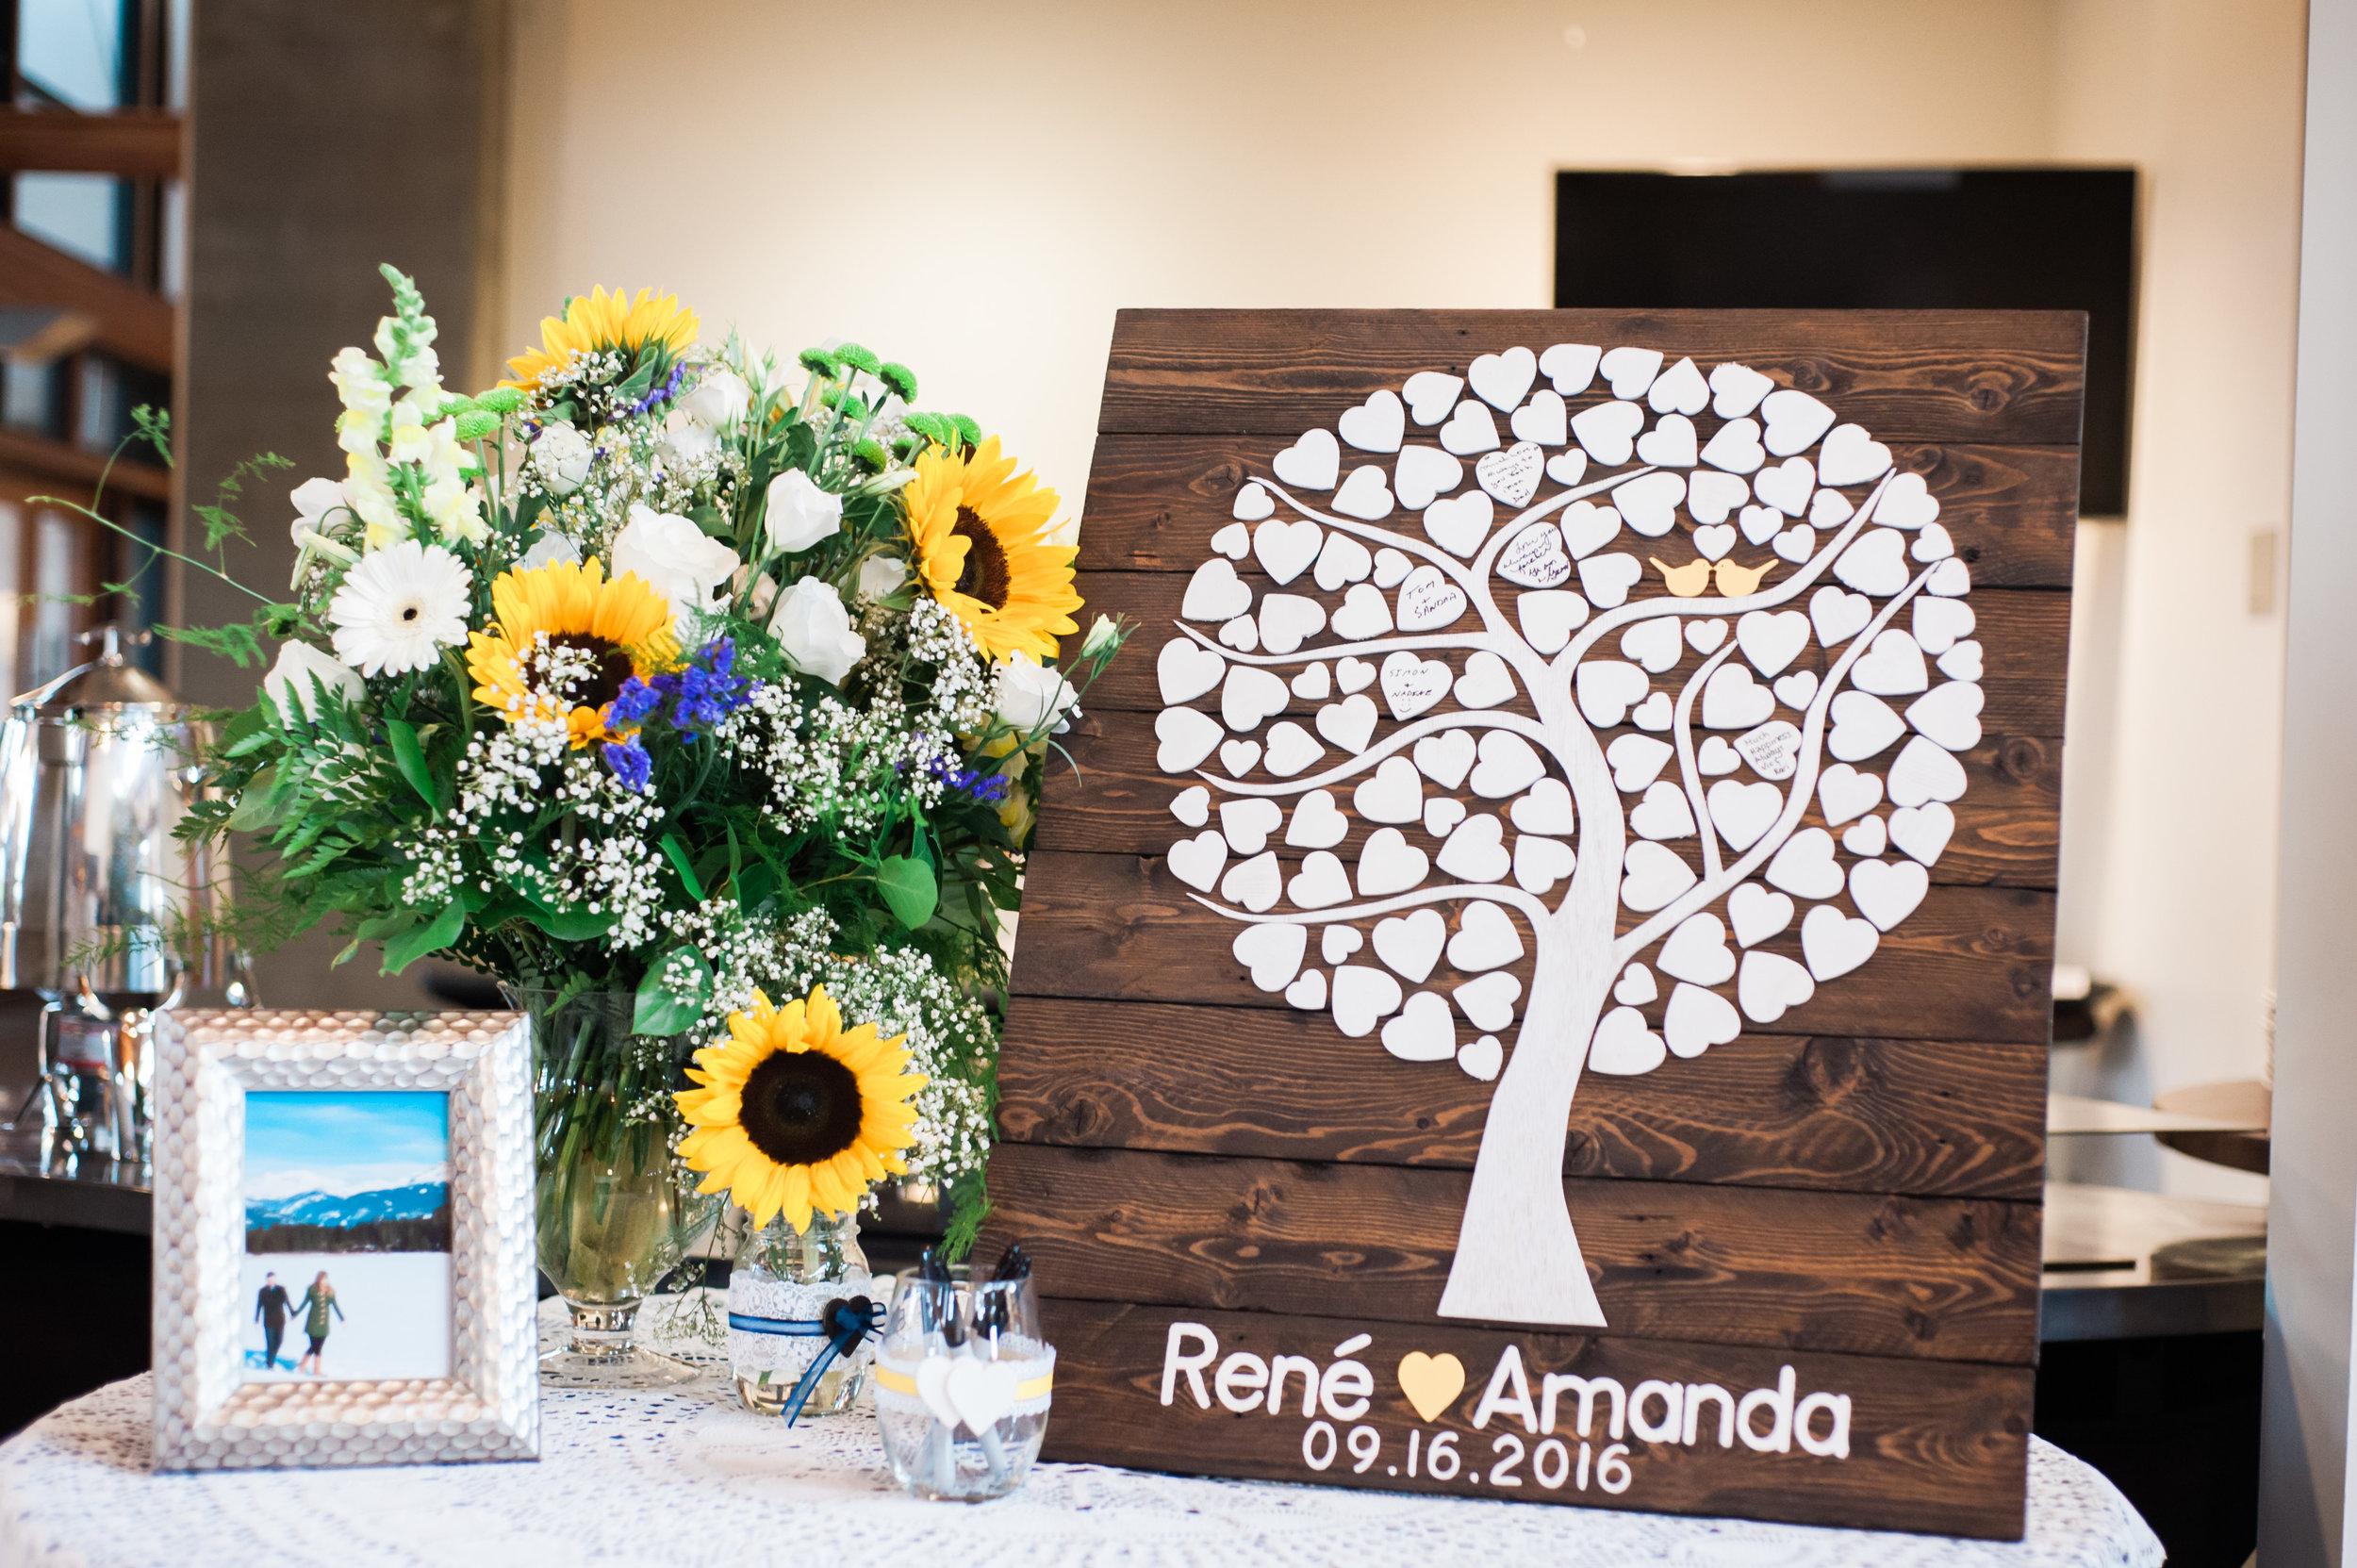 Amanda-rene-wedding-0555-jelger-tanja-photographers.jpg